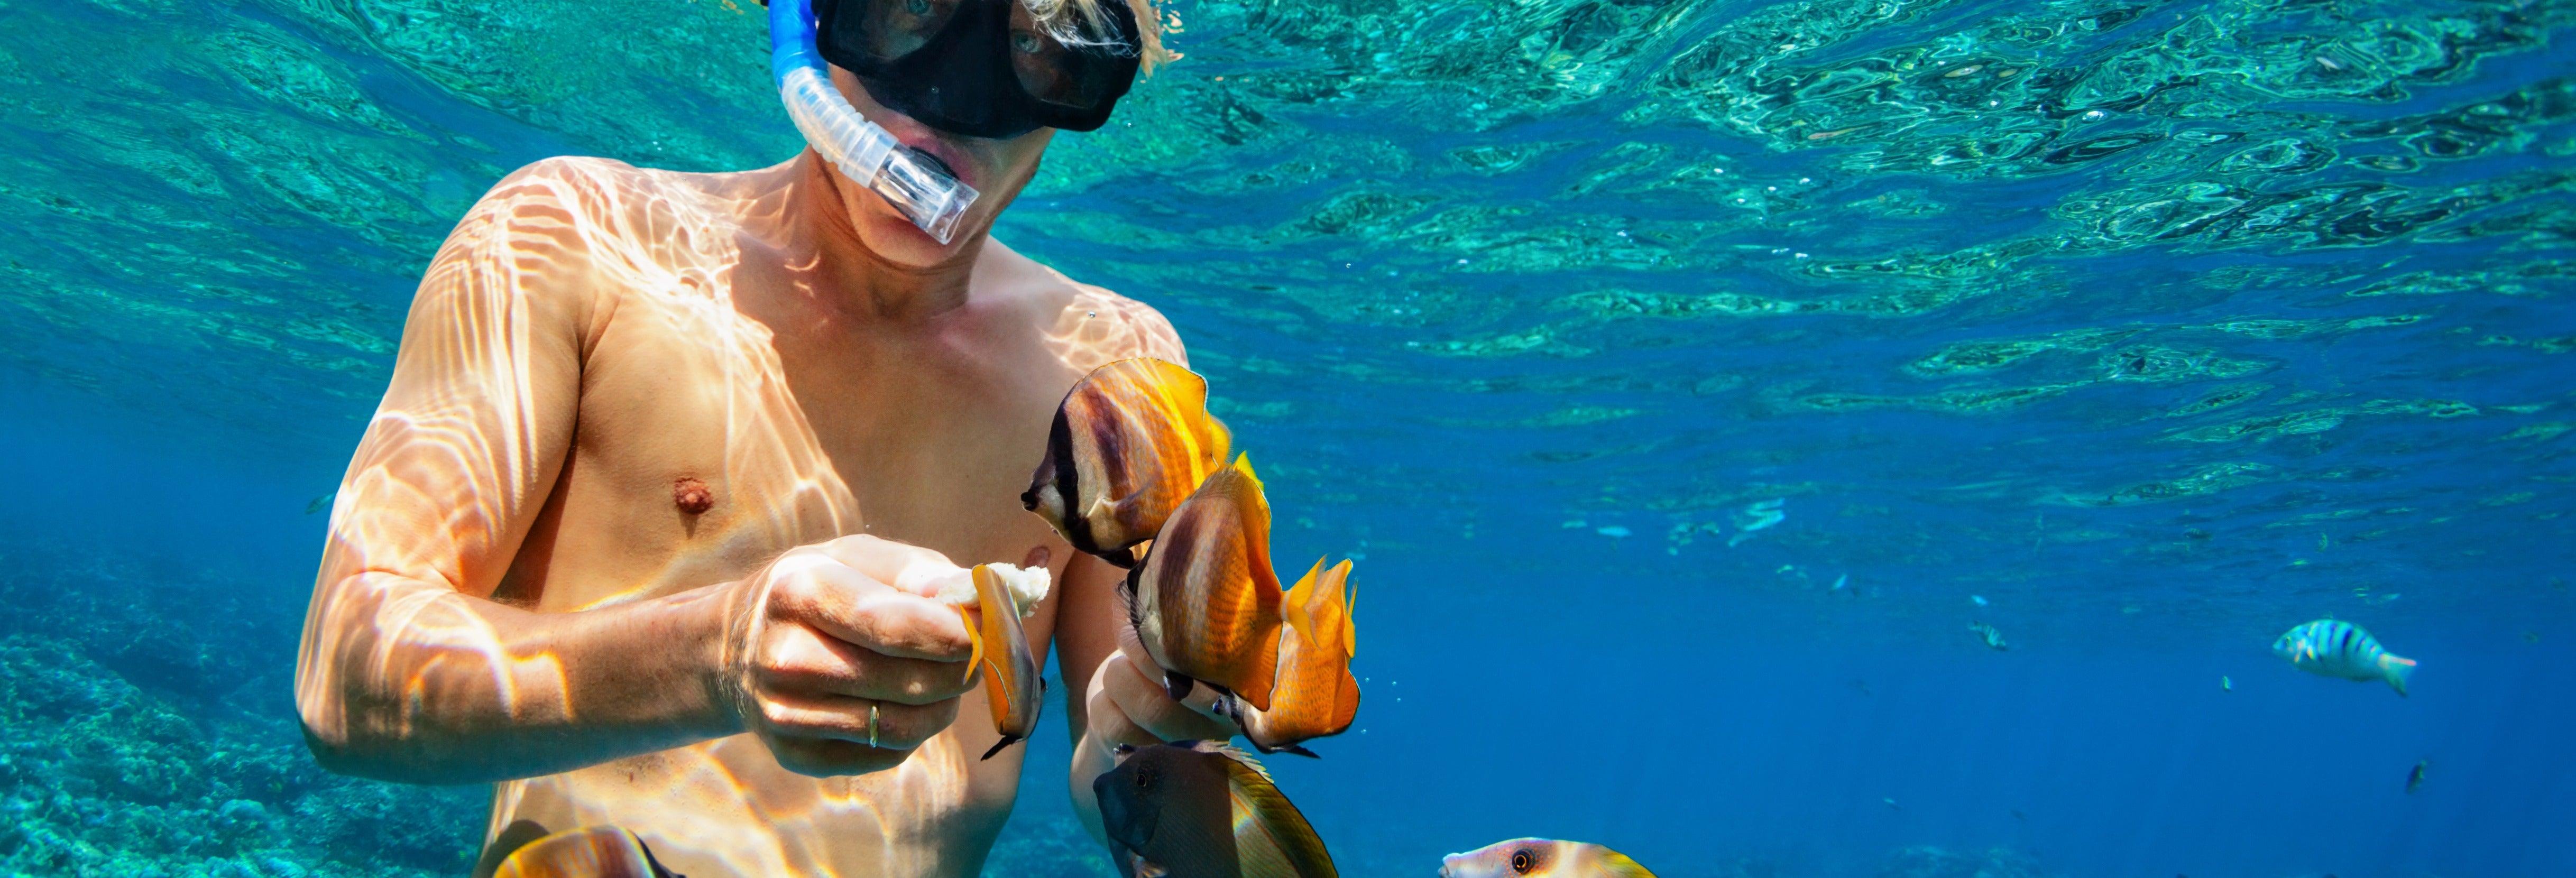 Snorkel en Nusa Penida y Nusa Lembongan